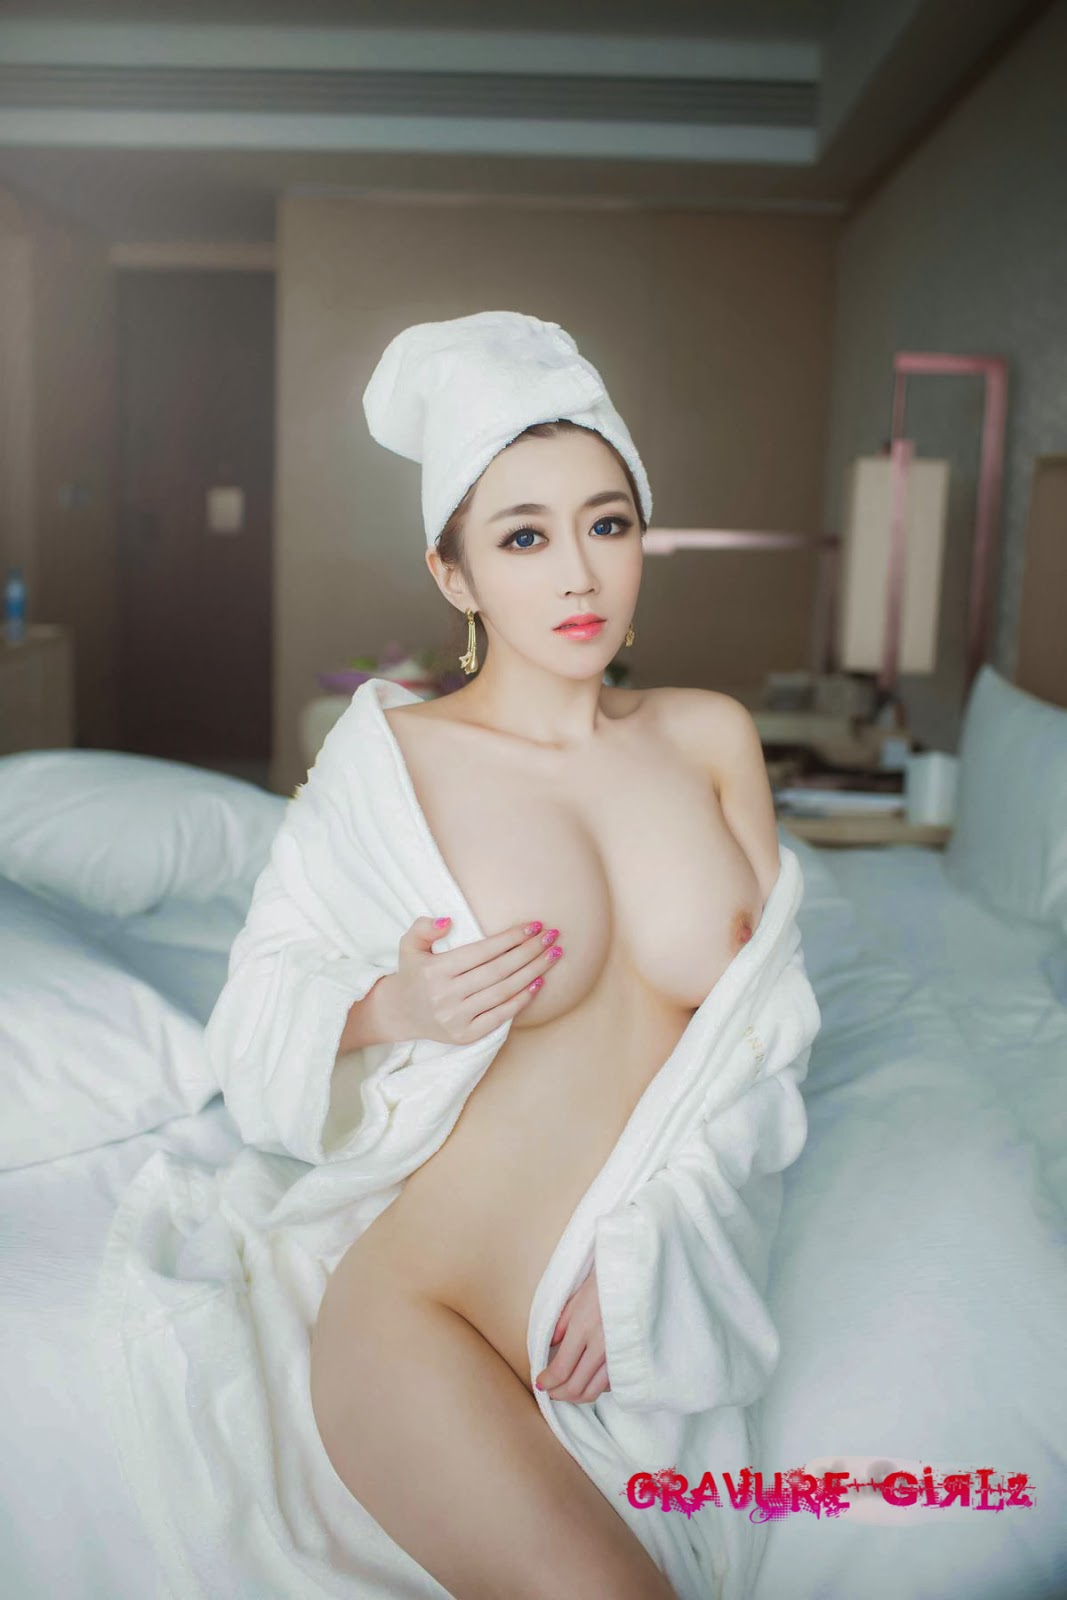 Big breast girls naked-1375